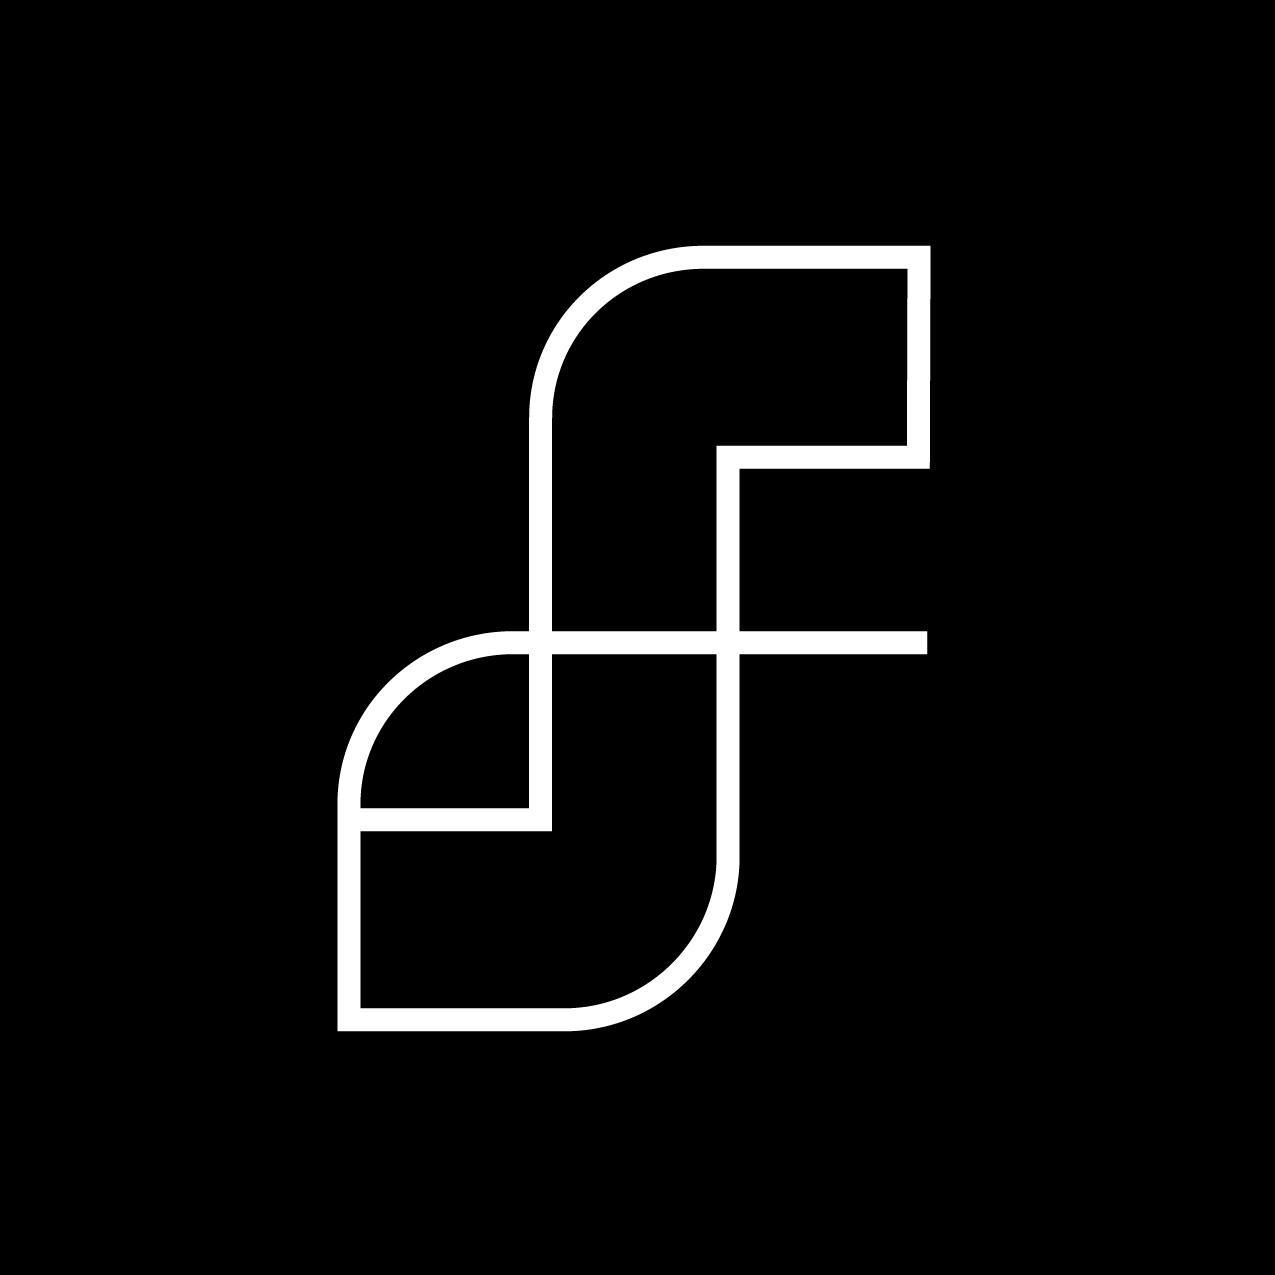 Letter F7 design by Furia